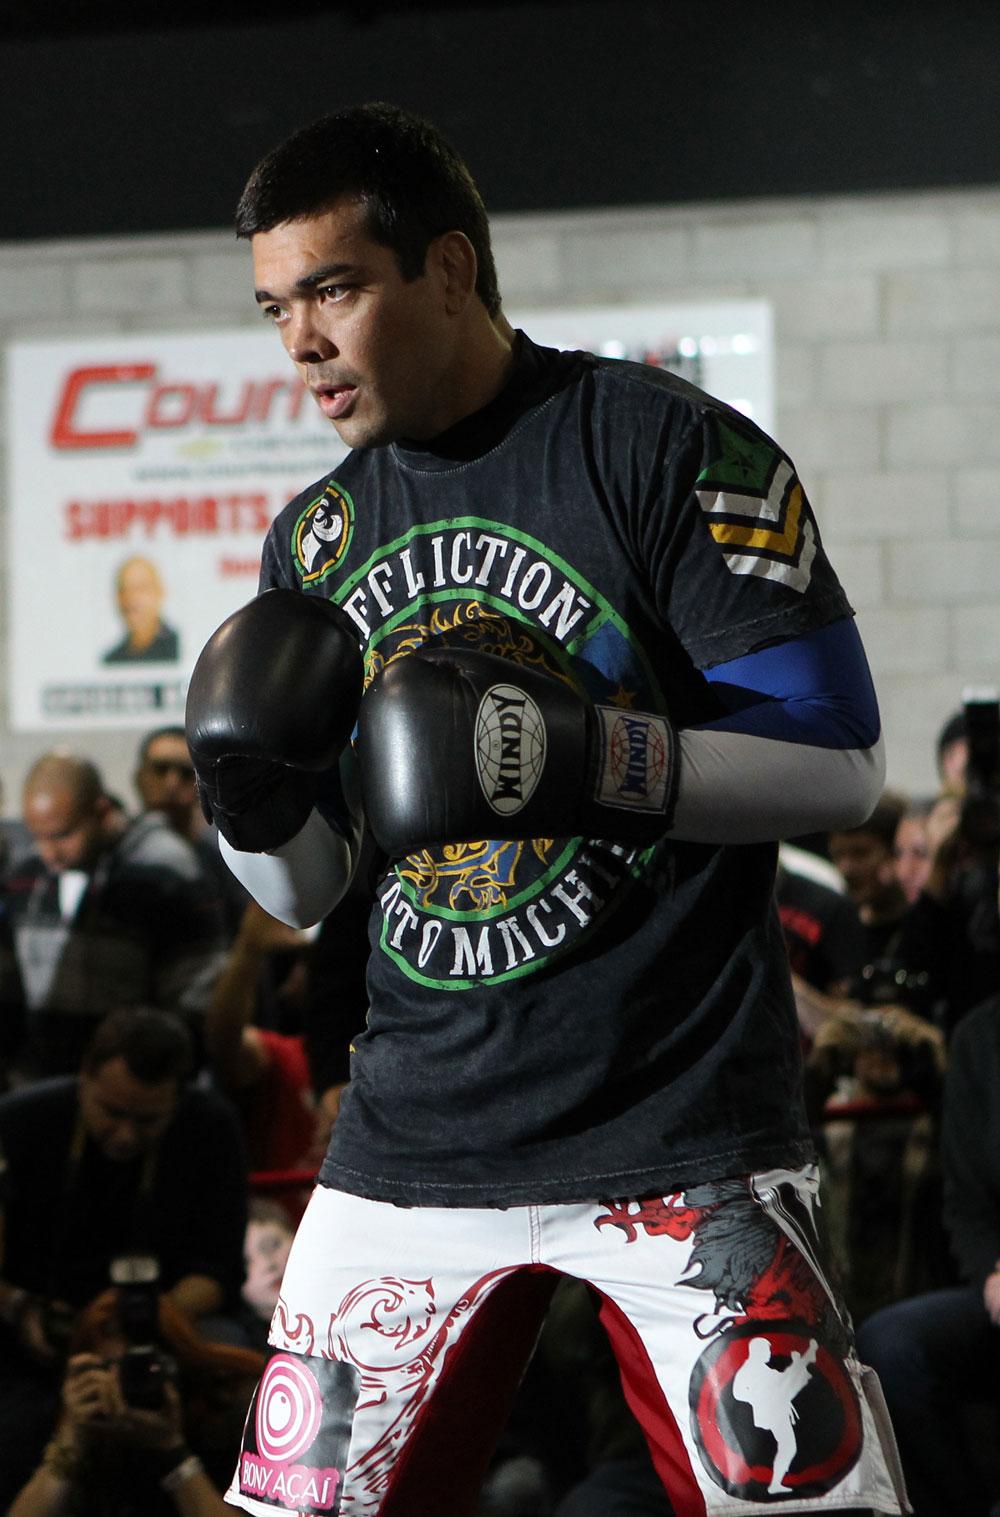 UFC light heavyweight Lyoto Machida